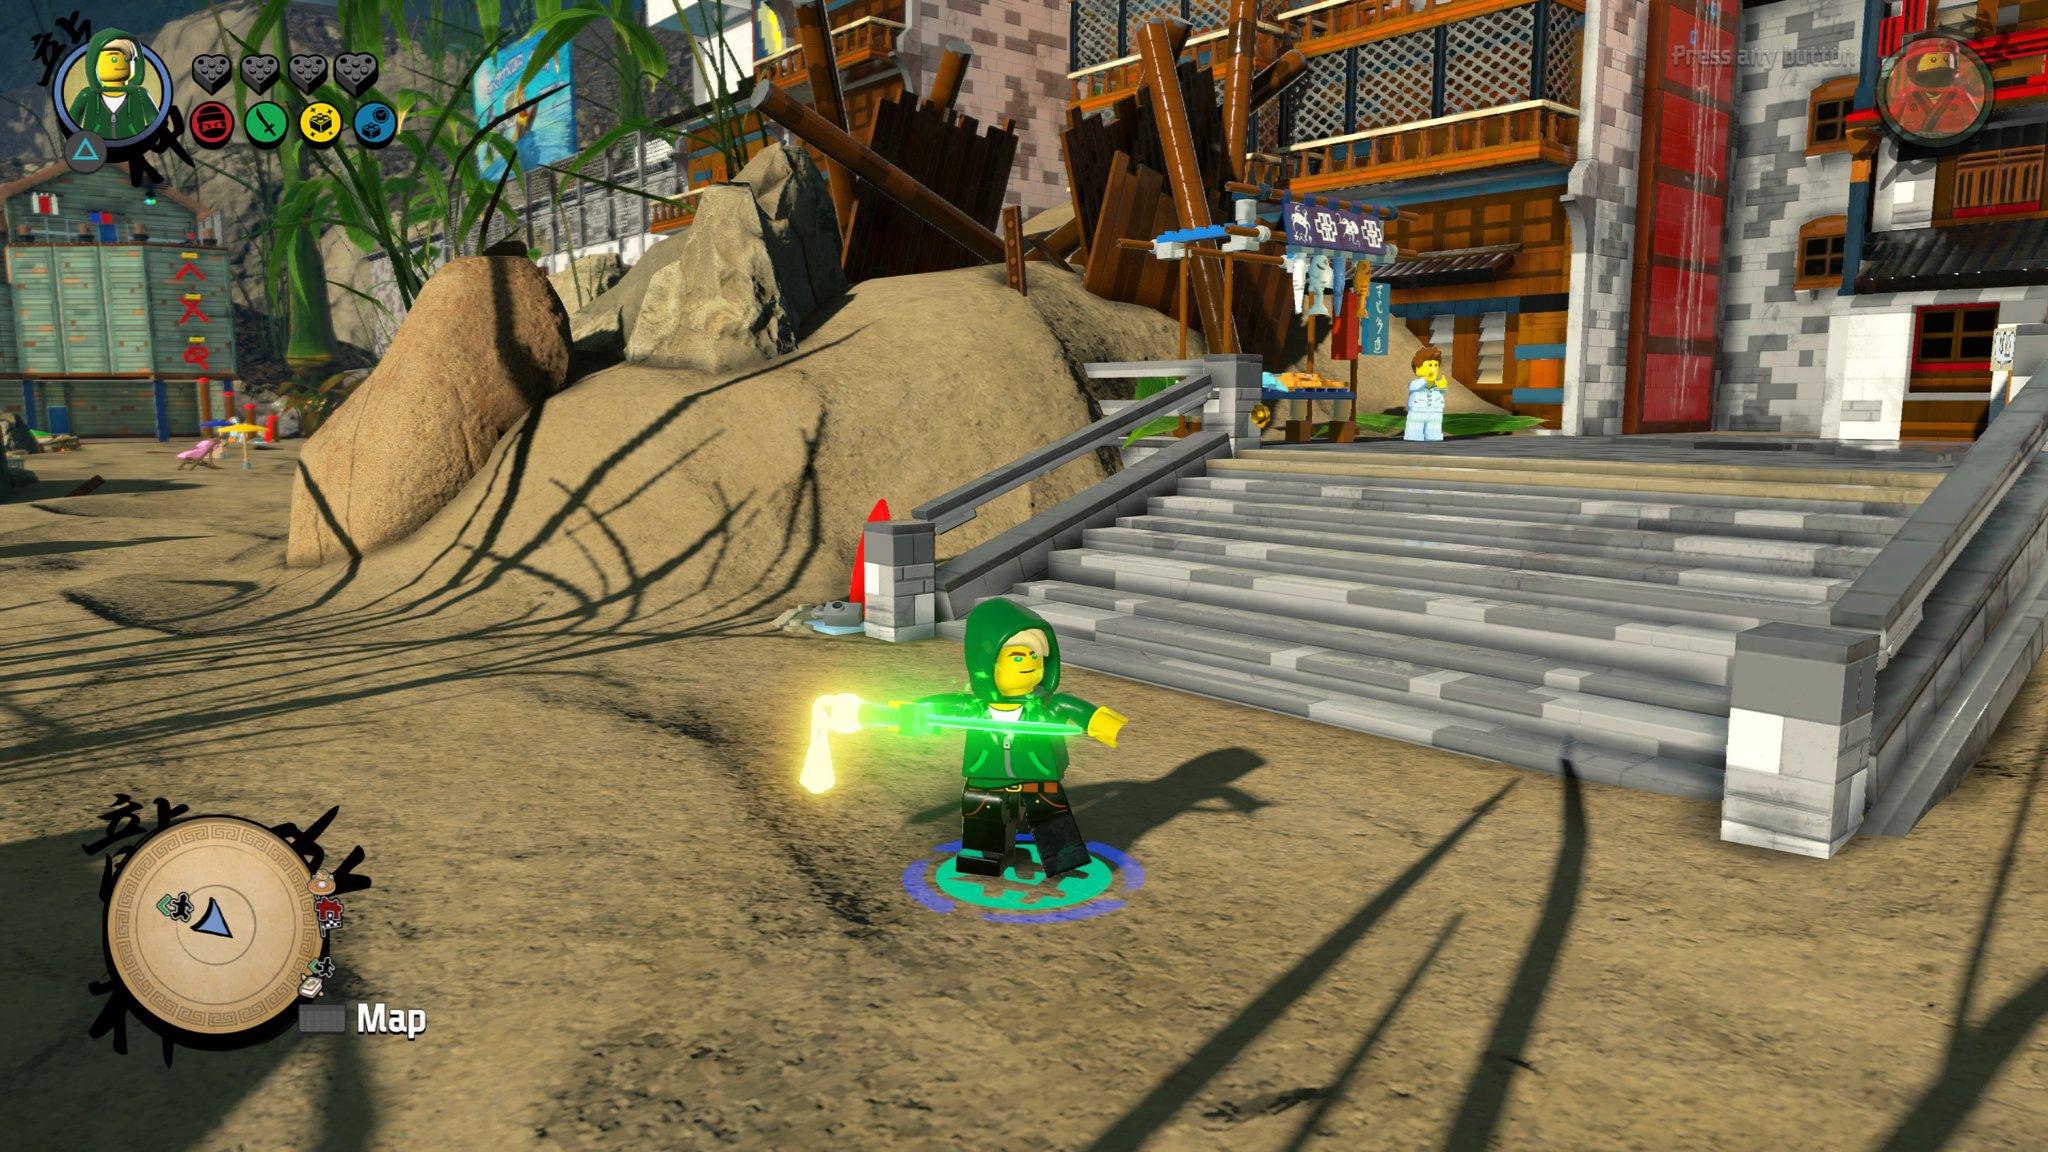 Finally Completed The Lego Ninjago Movie Video Game Hooded Lloyd Secret Character Unlocked Fbtb